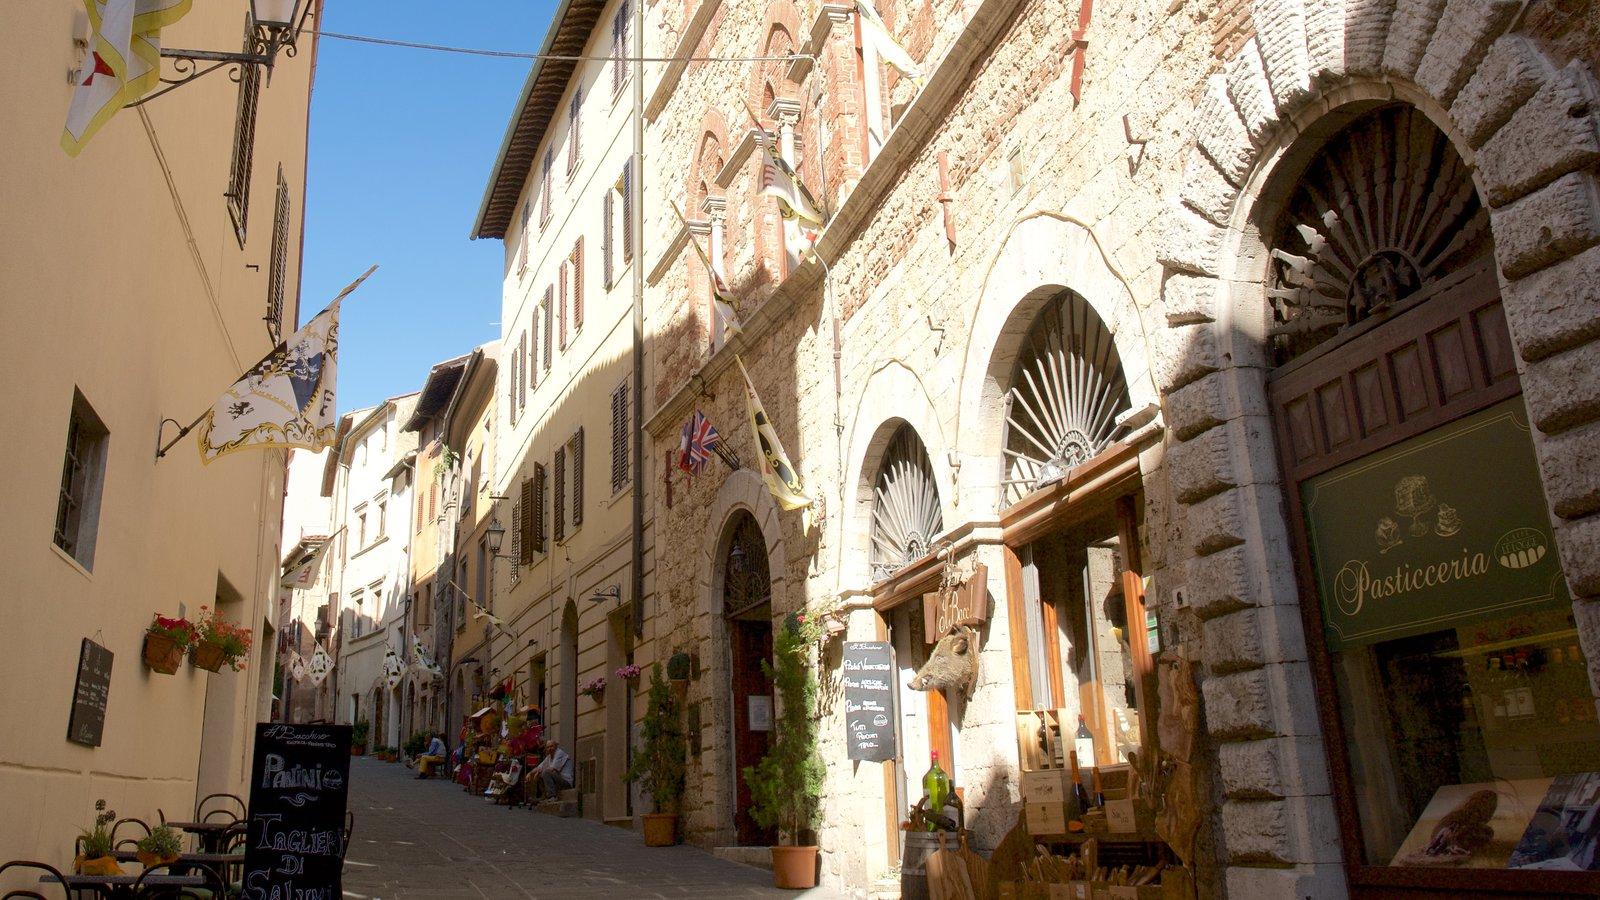 Massa Marittima featuring heritage architecture and street scenes